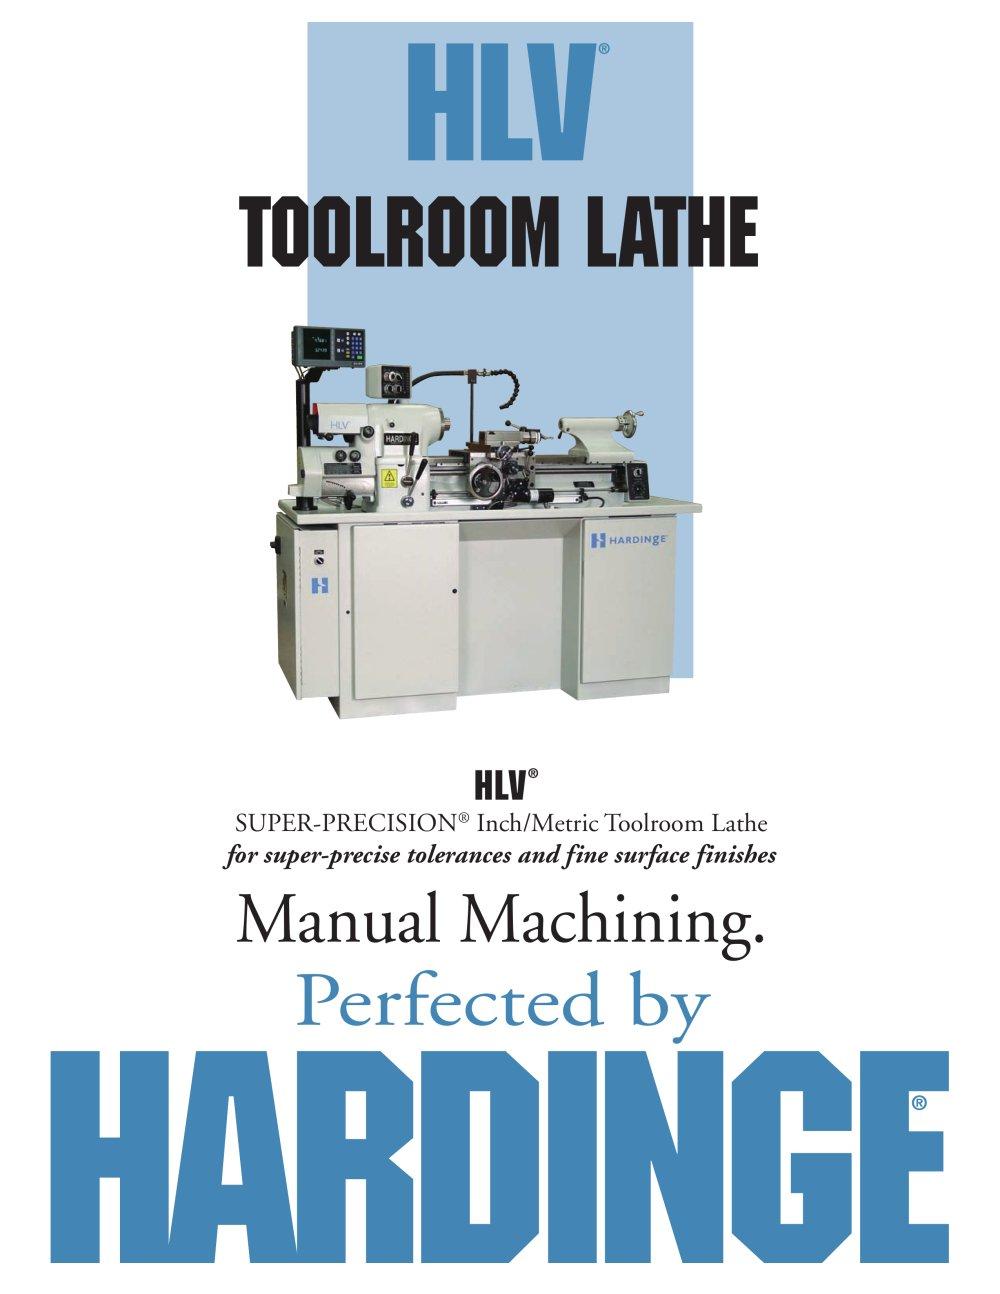 hlv manual toolroom lathe hardinge bridgeport pdf catalogue rh pdf directindustry com hardinge lathe manual hlvh em hardinge lathe manuals pdf